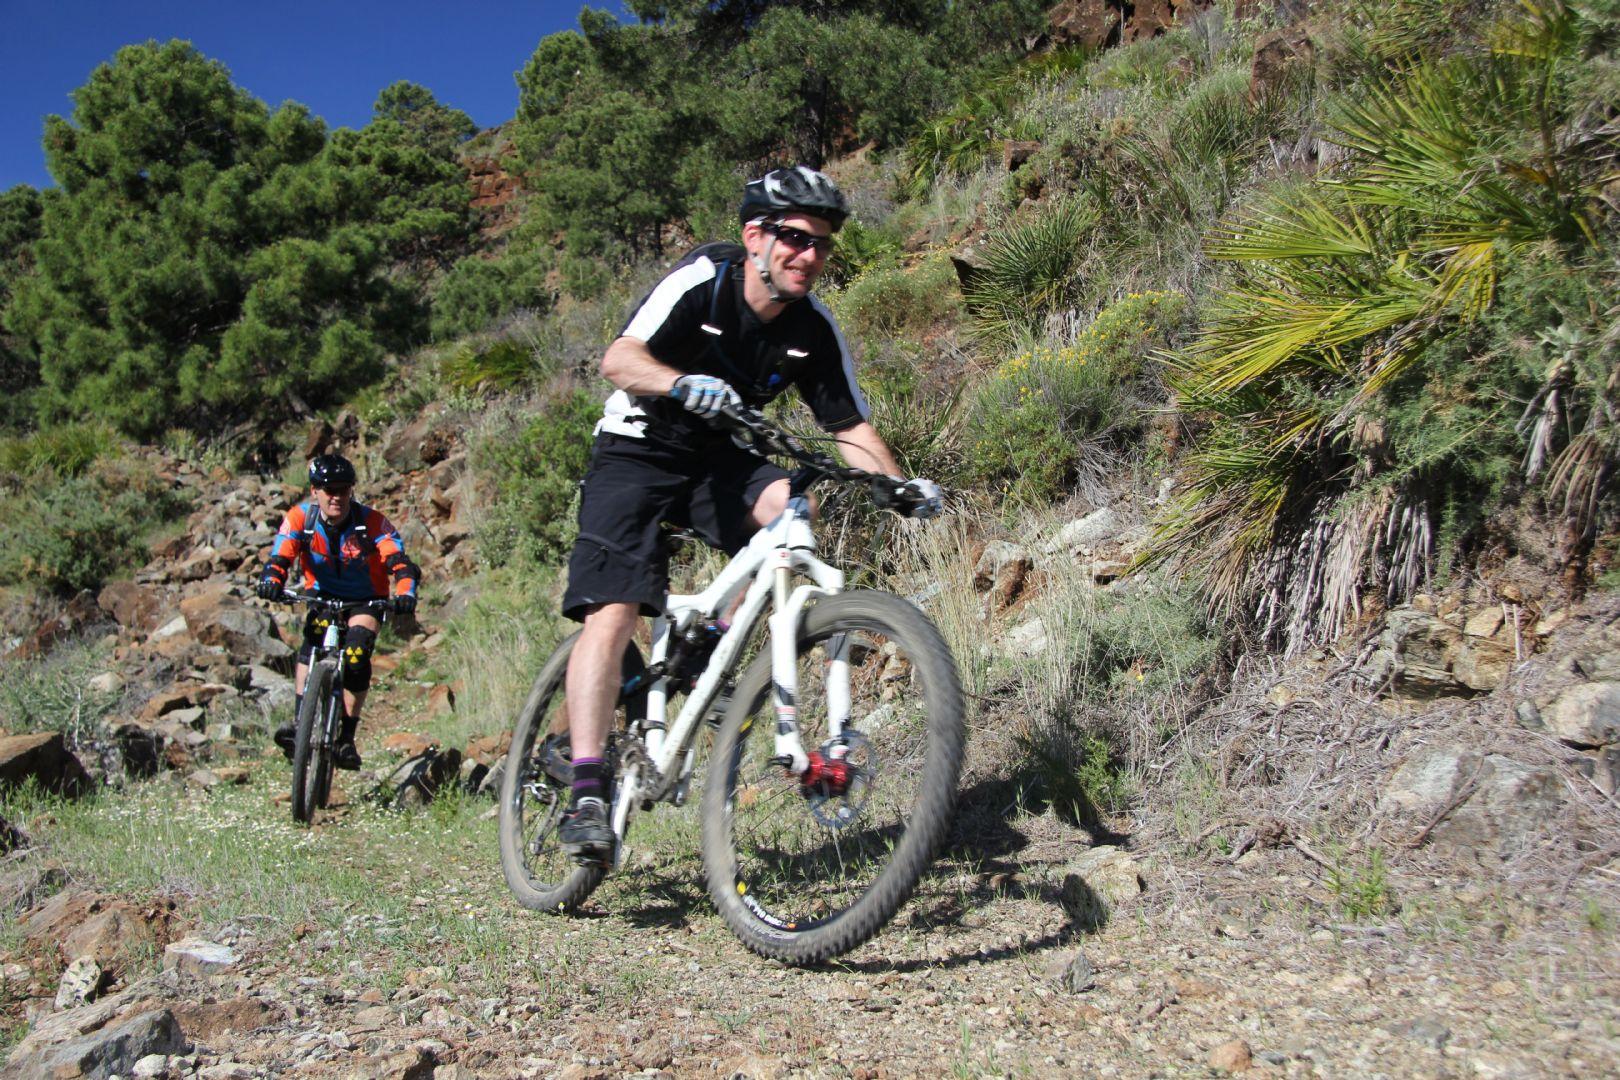 IMG_9108.JPG - Spain - Trans Andaluz - Guided Mountain Bike Holiday - Mountain Biking